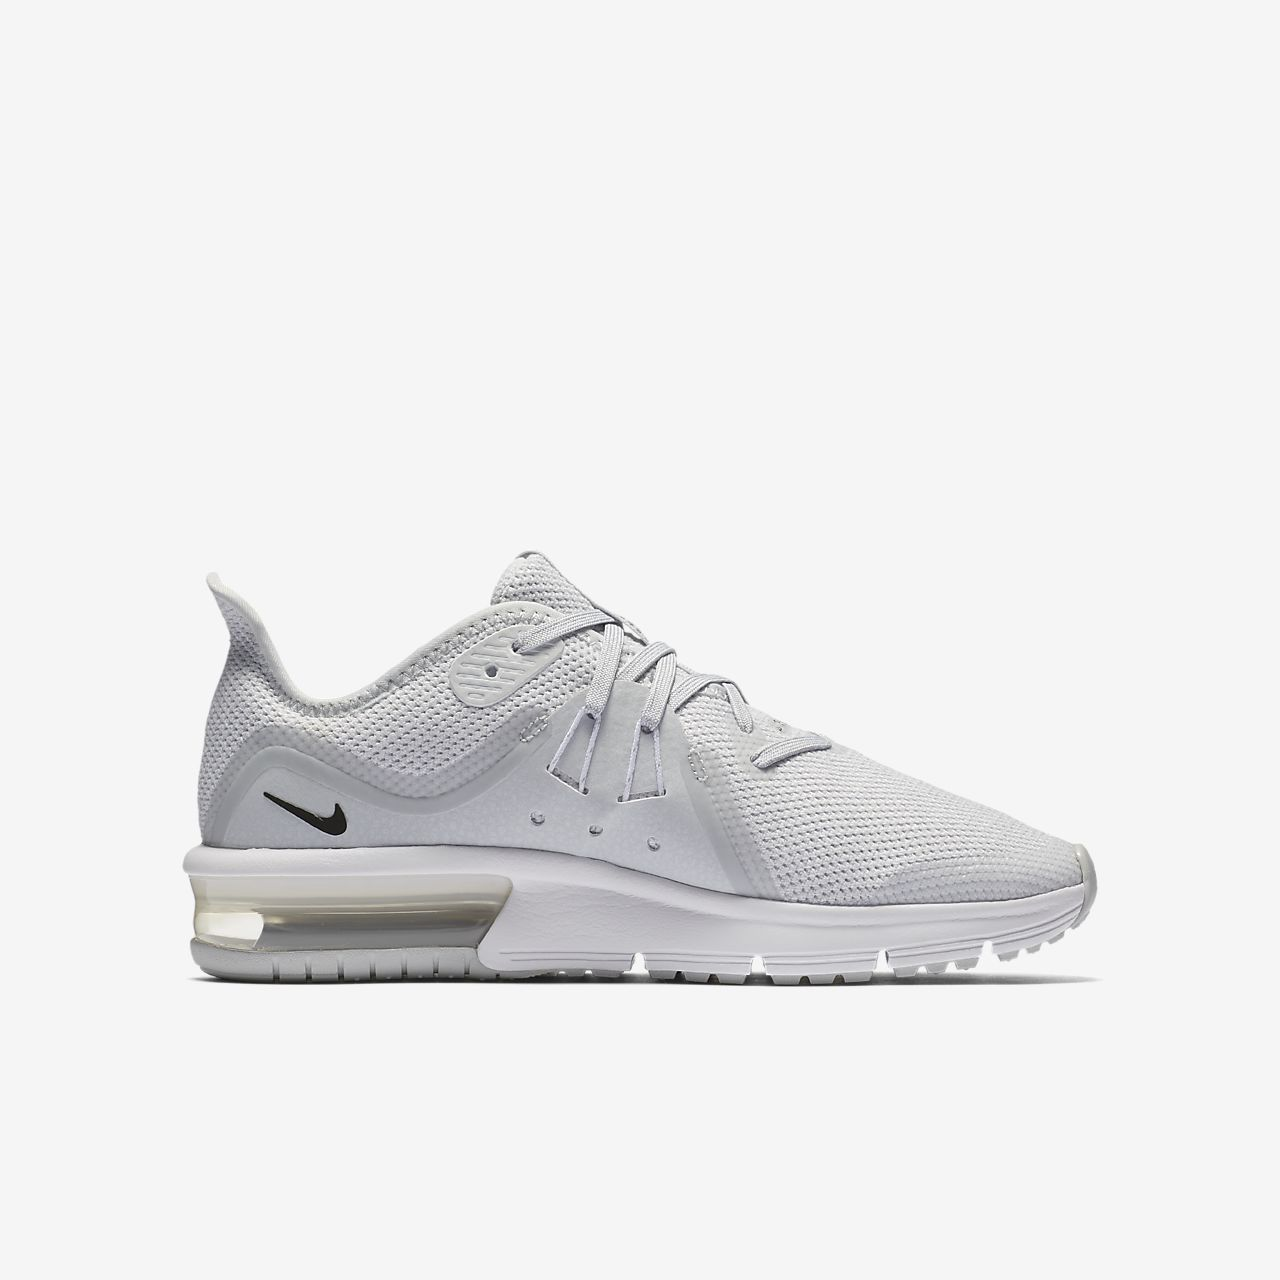 cheaper 90303 40a45 ... Nike Air Max Sequent 3 Older Kids  Shoe